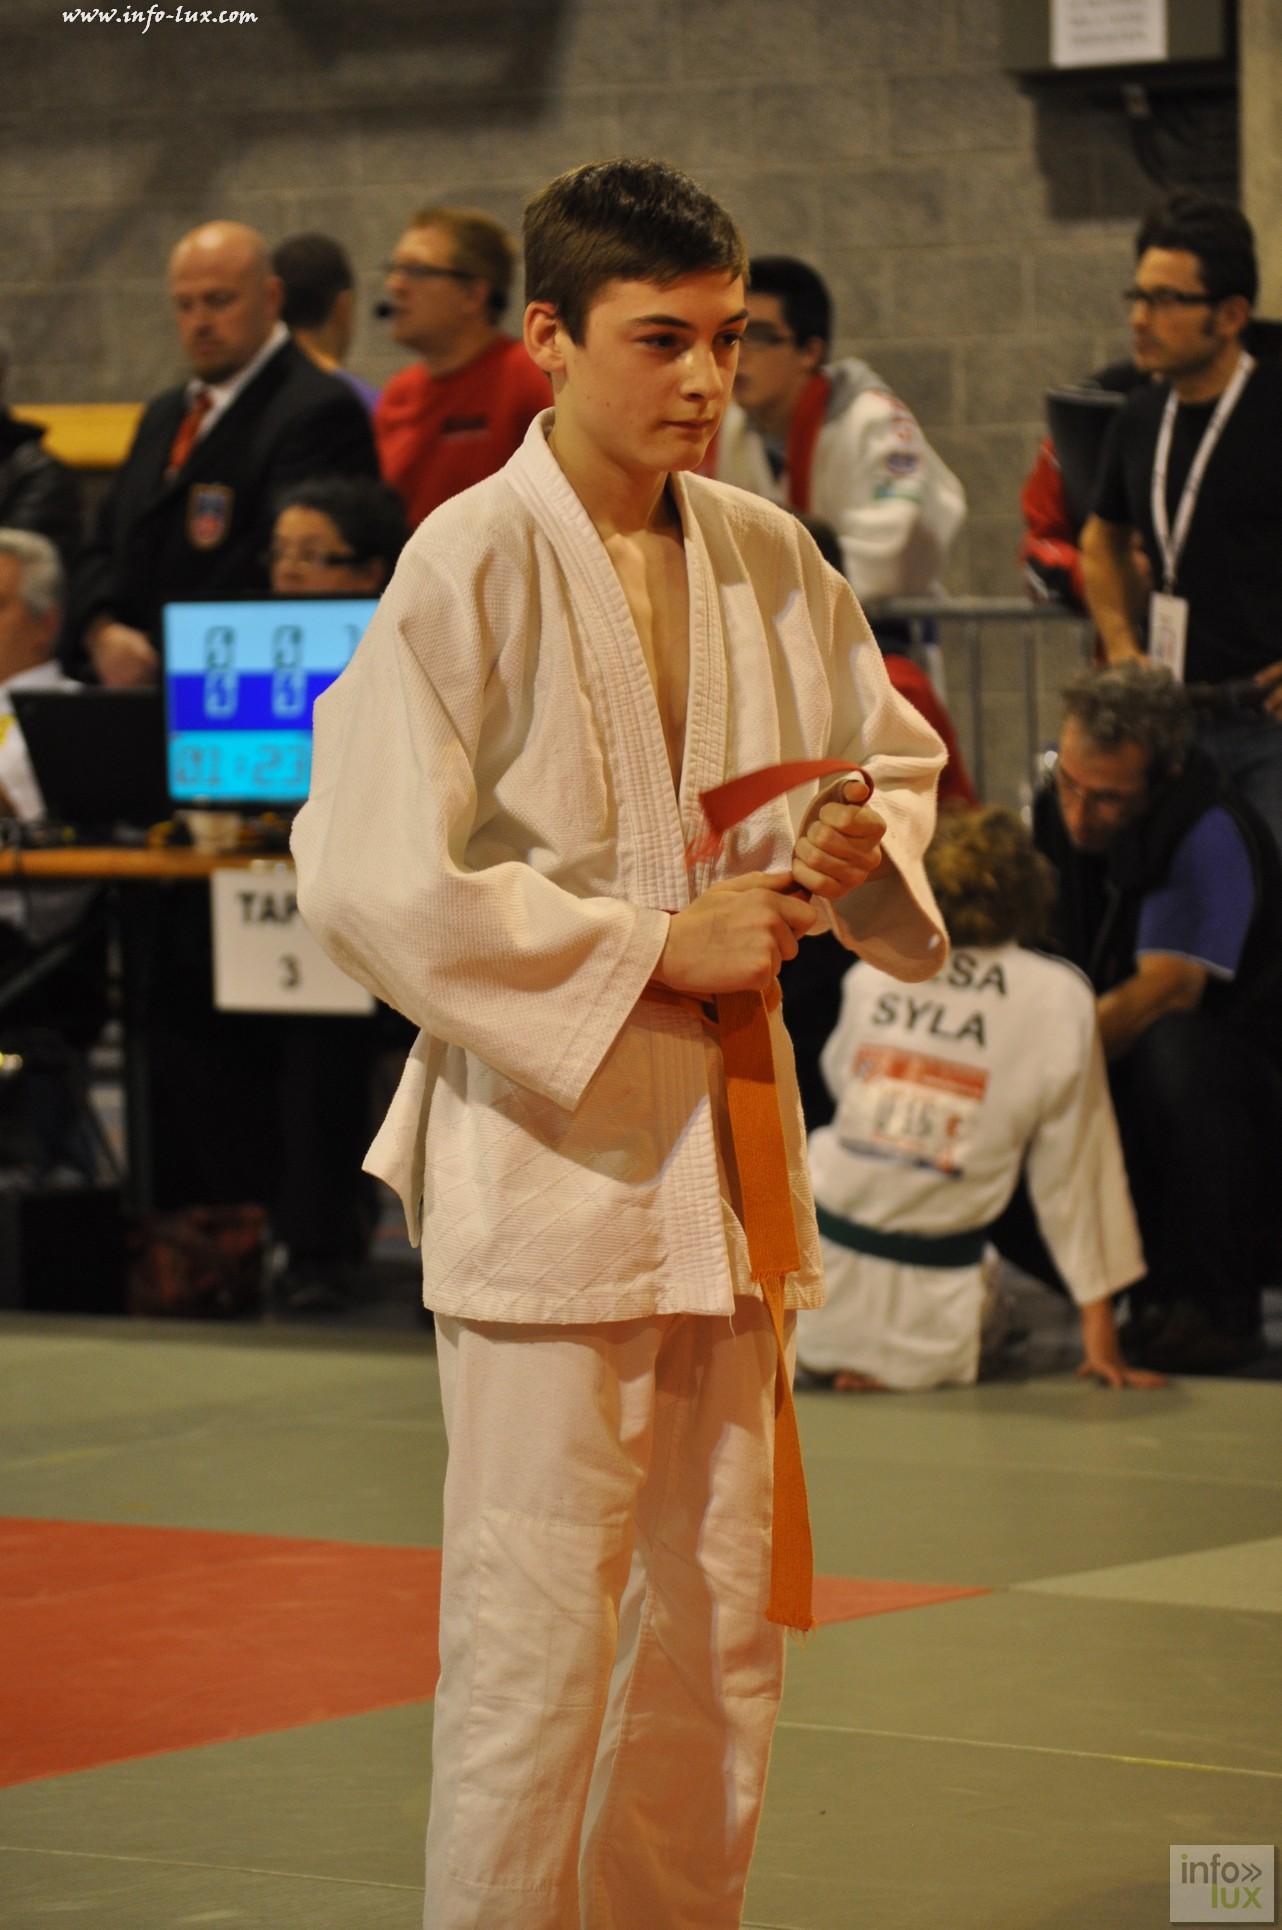 images/stories/PHOTOSREP/Bastogne/judo/Judo-Basto139